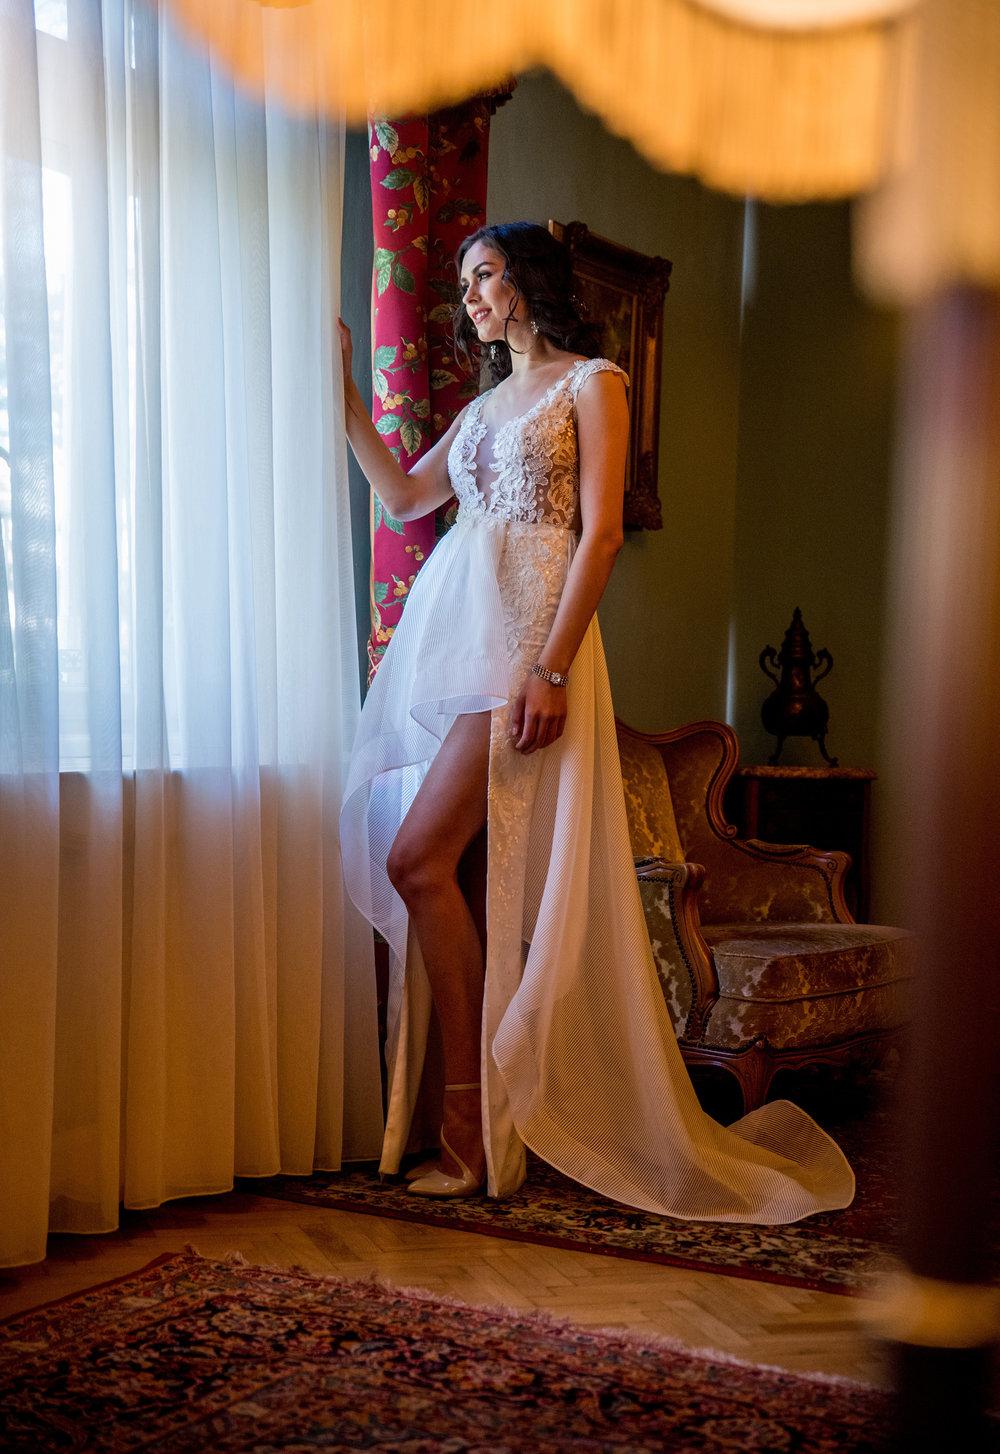 Featured:  Crocus , an A-line asymmetric wedding dress crafted in fine lace and light veil, featuring a high leg slit skirt and short train.